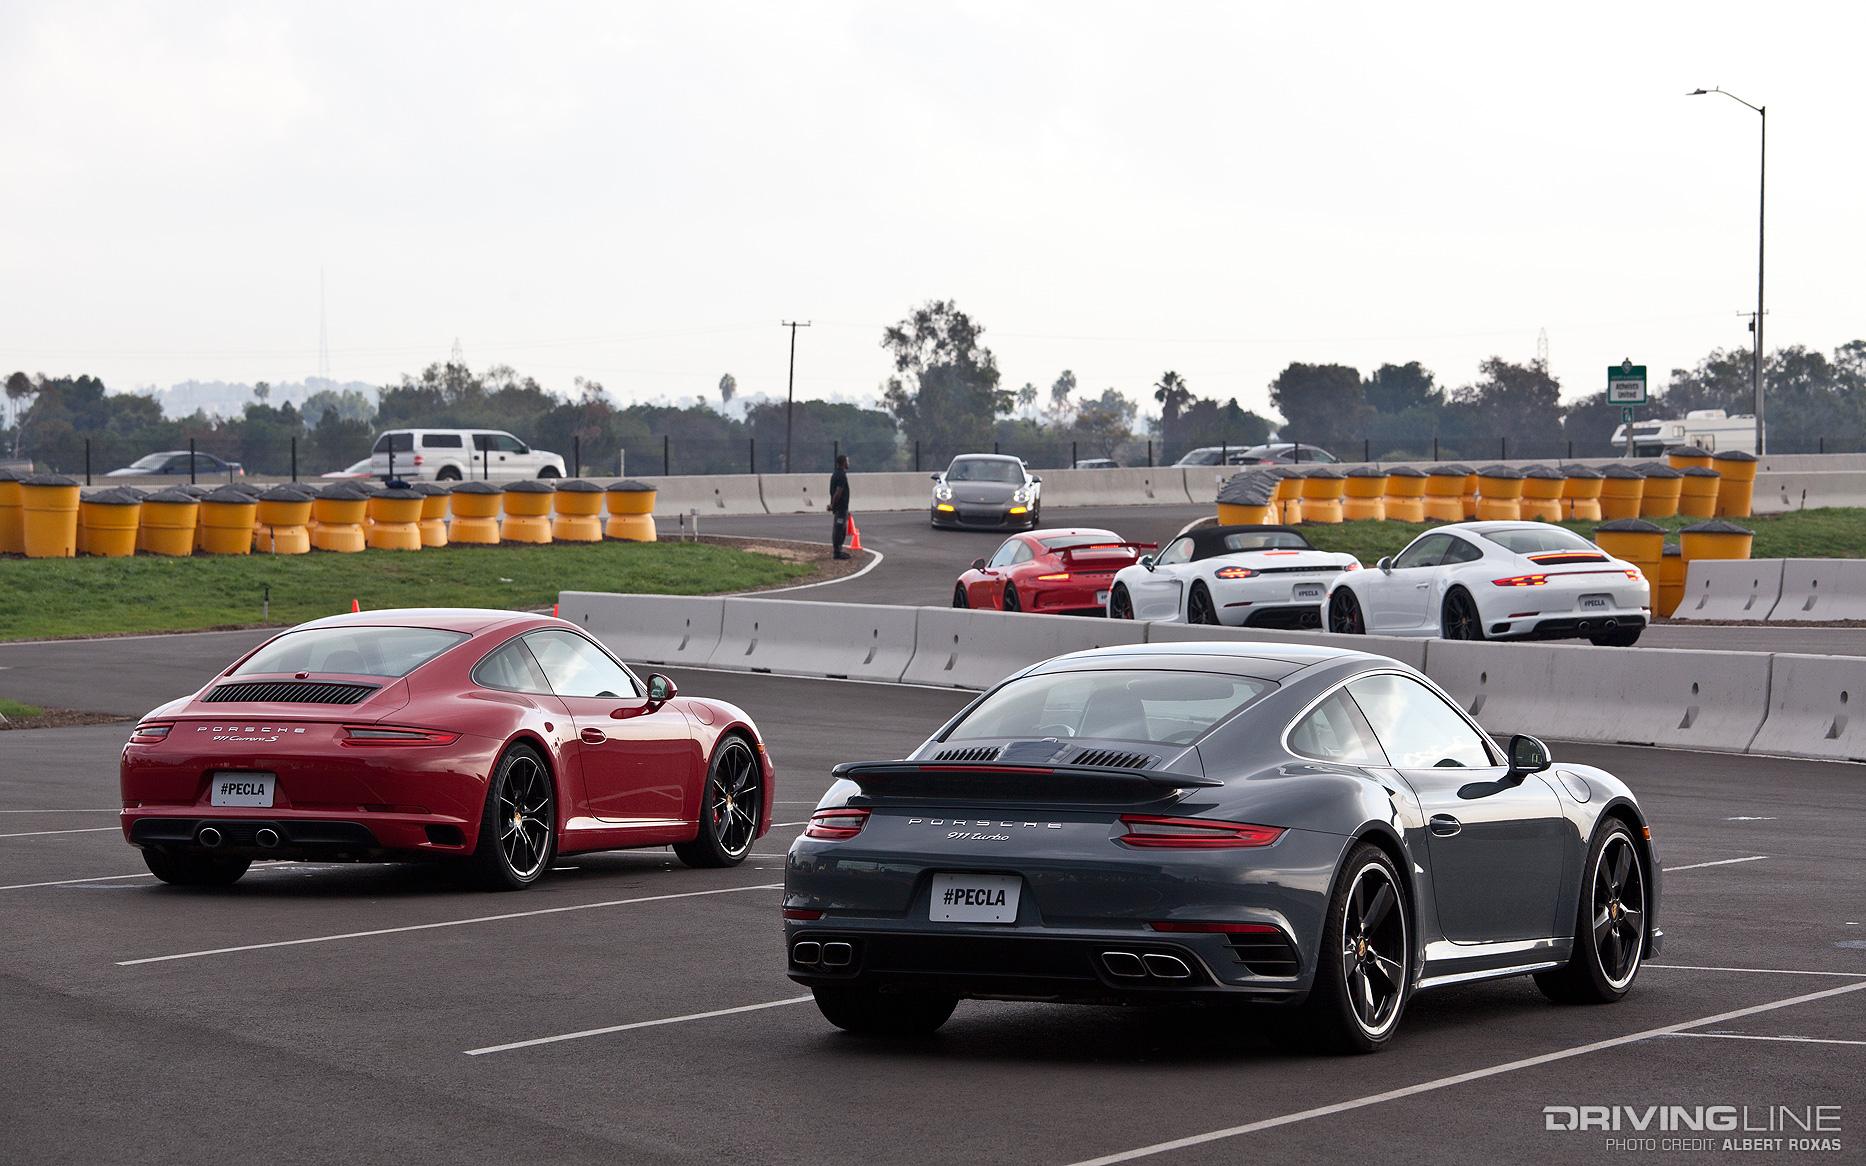 Porsche Driving Experience Carson >> Porsche Gives Los Angeles an Early Christmas Gift | DrivingLine